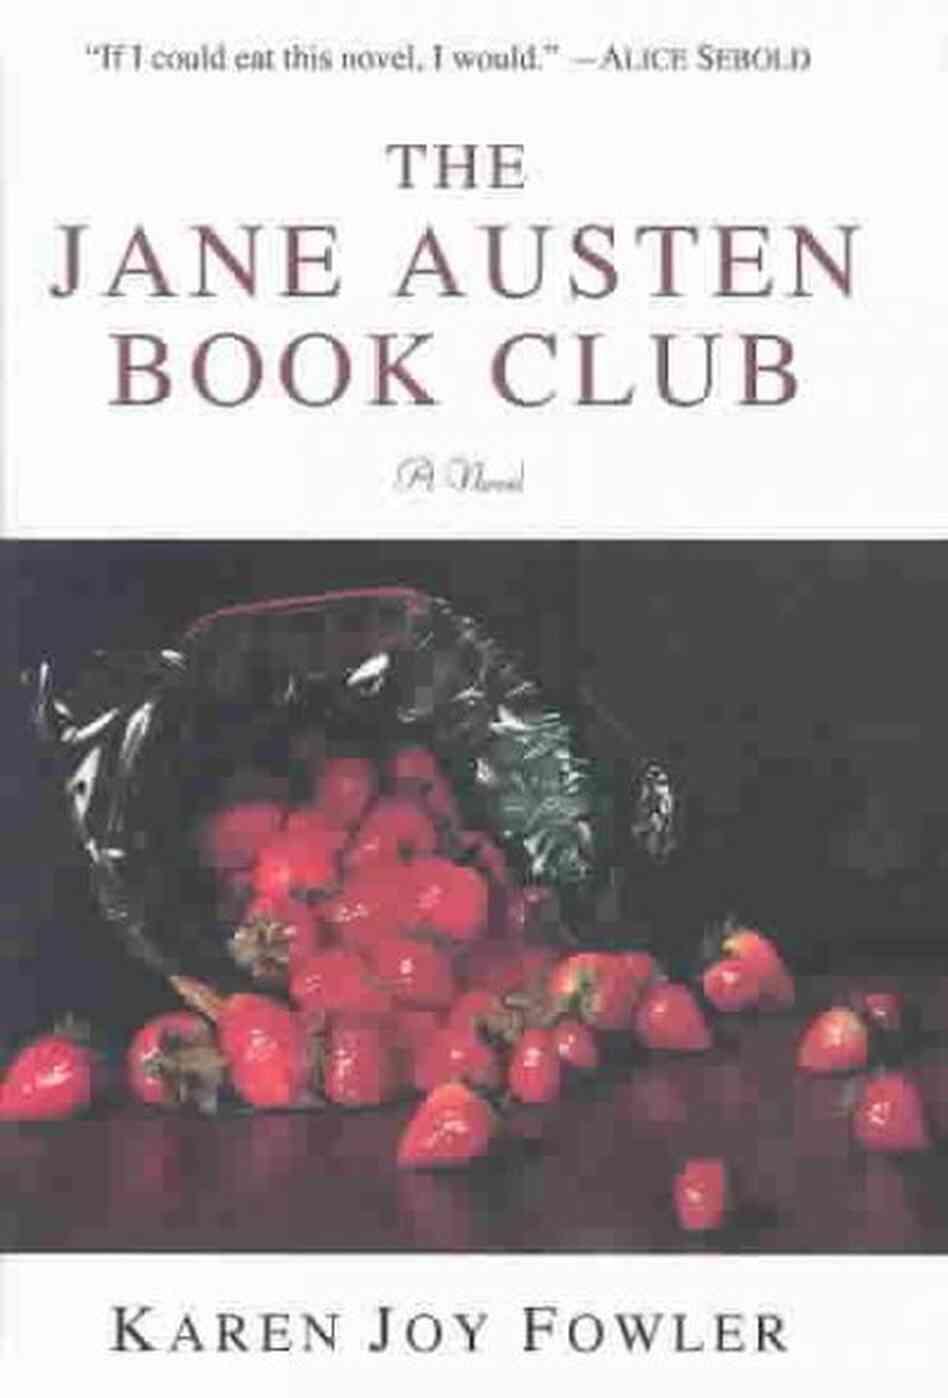 Jane Austen Pretty Book Covers : The jane austen book club npr